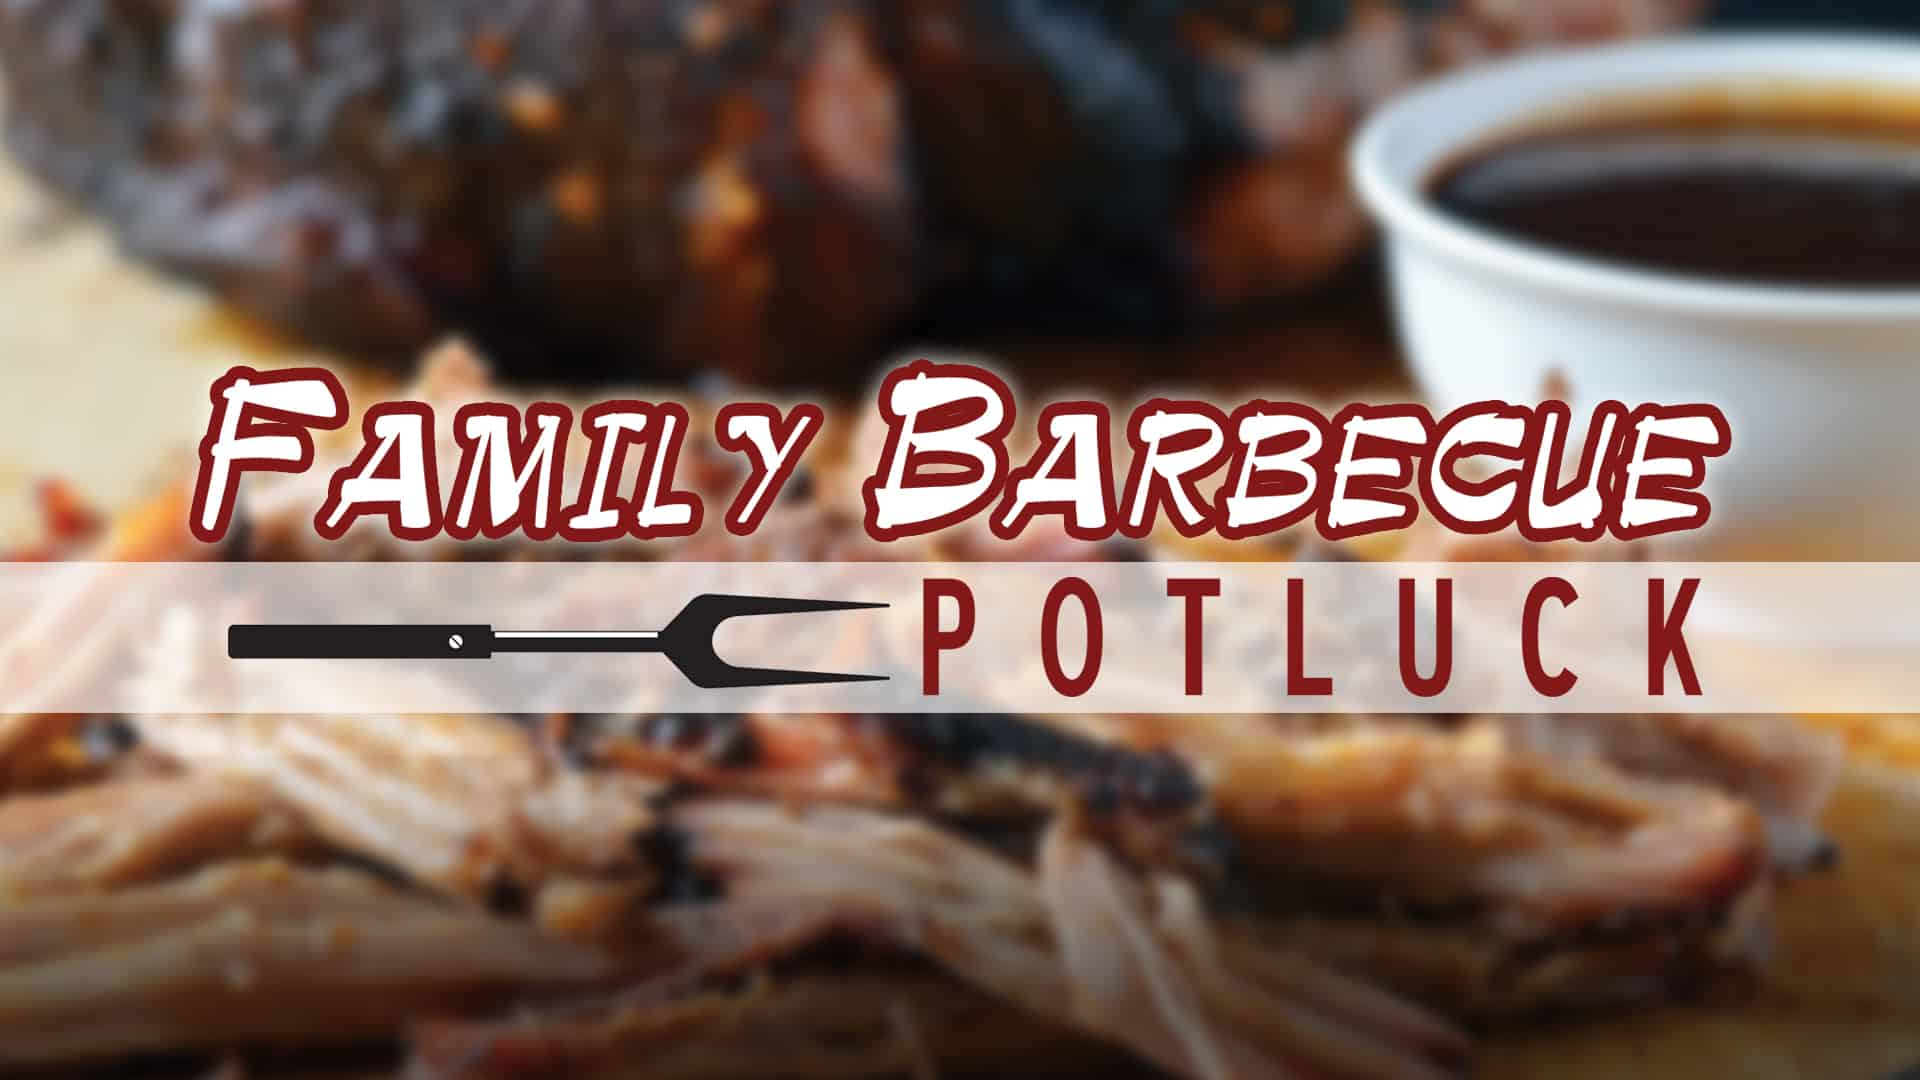 Family-BBQ-Potluck-1